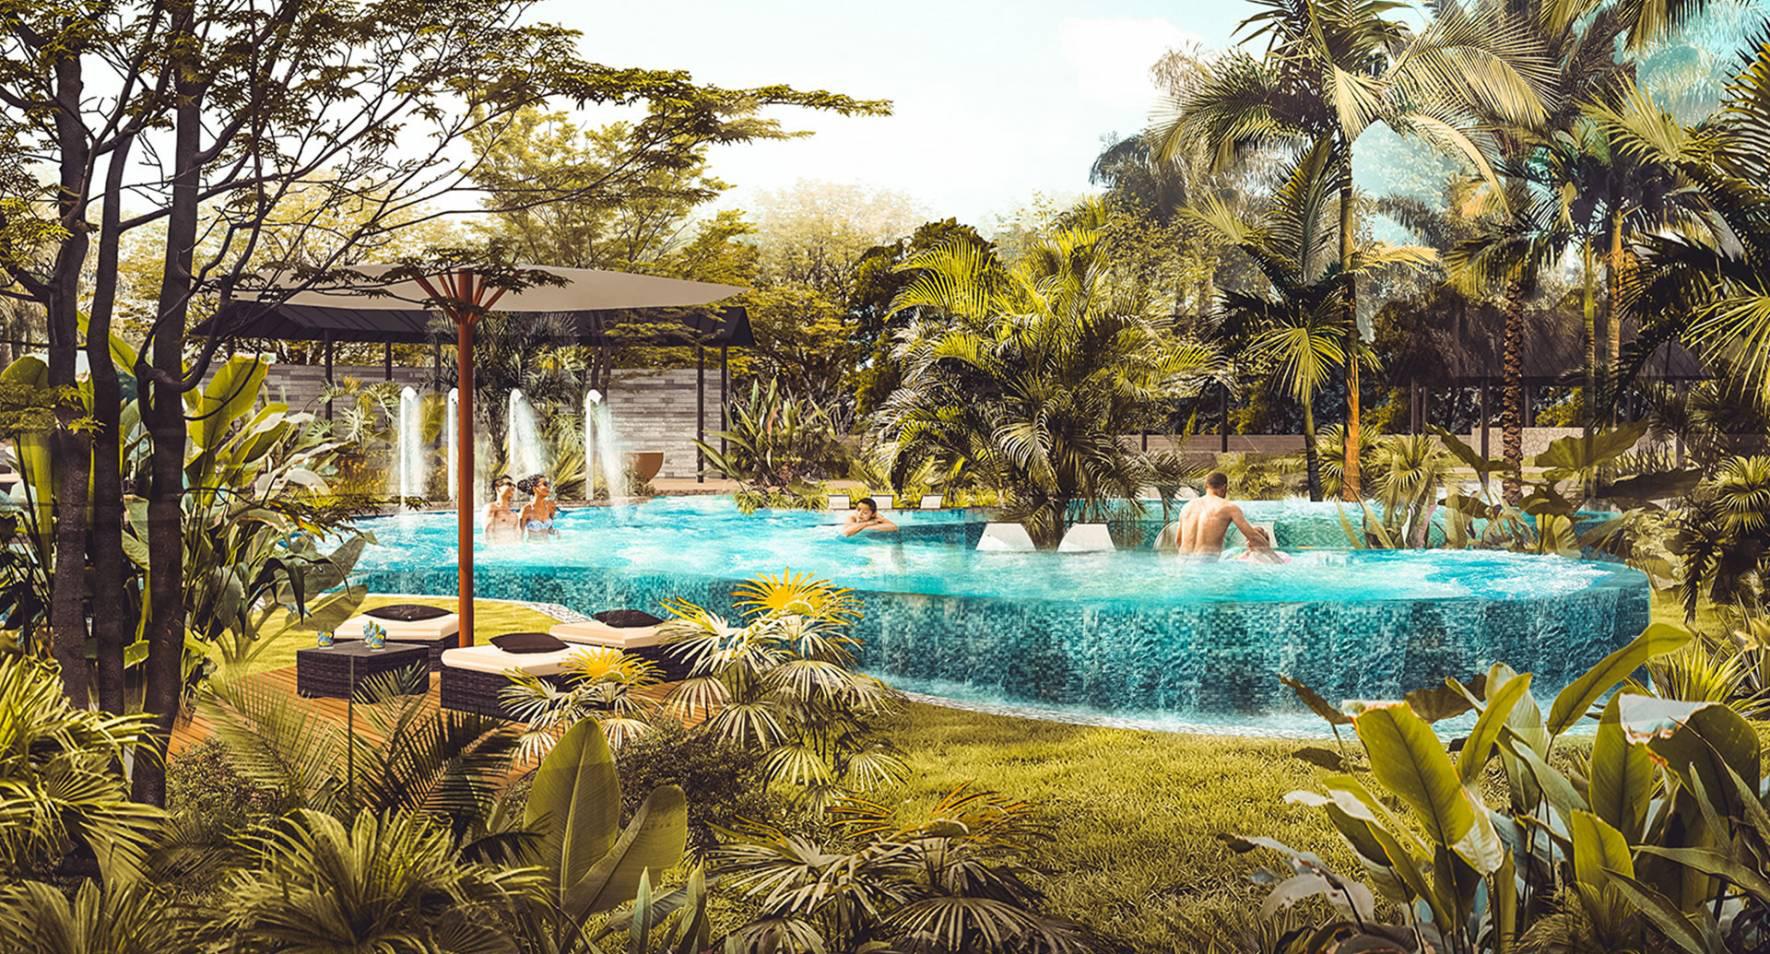 Minera Hot Springs Binh Chau